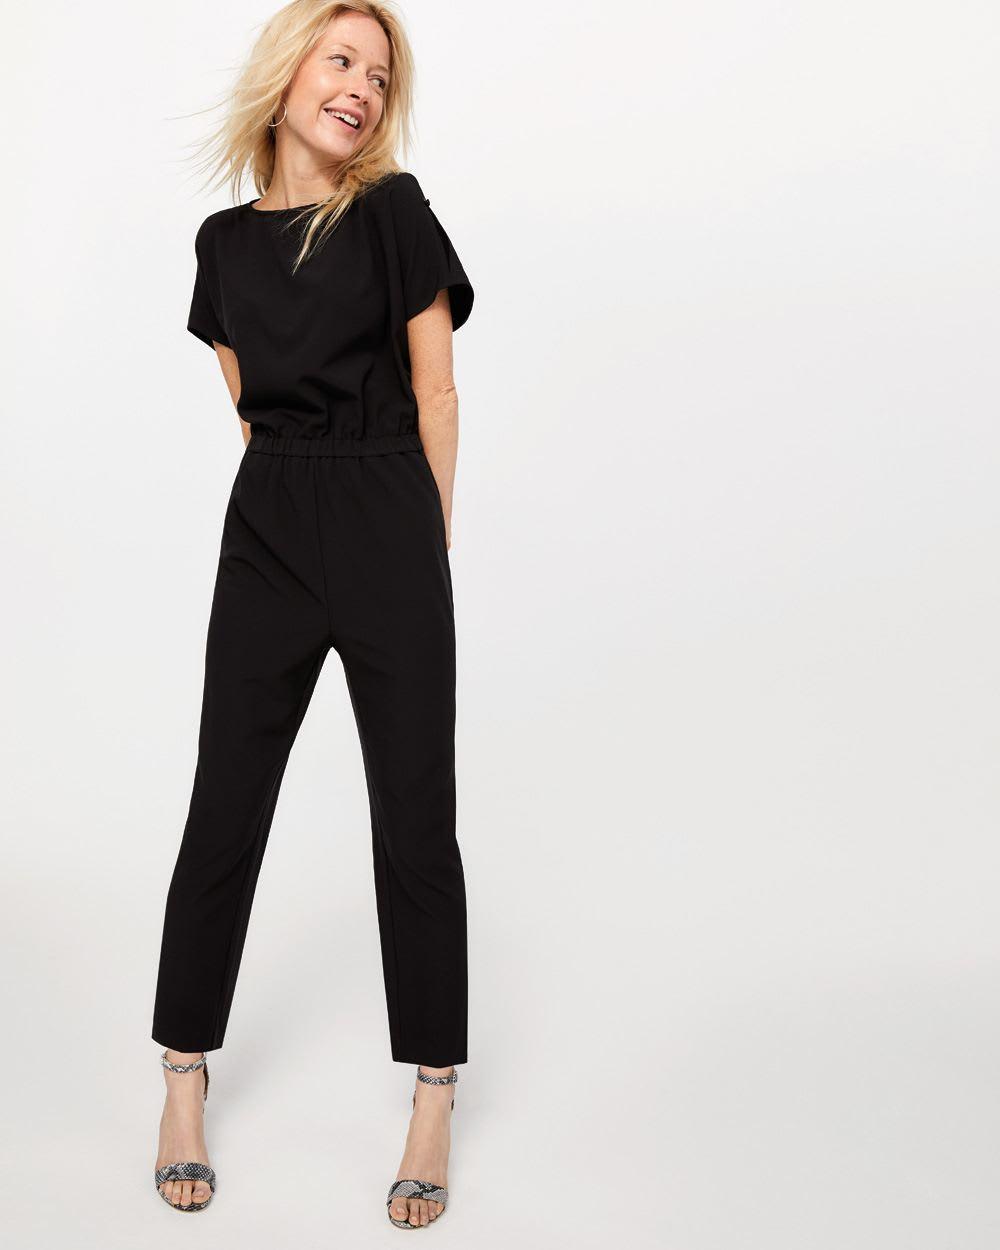 terrific value fine quality great discount for Short Sleeve Jumpsuit | Regular | Reitmans